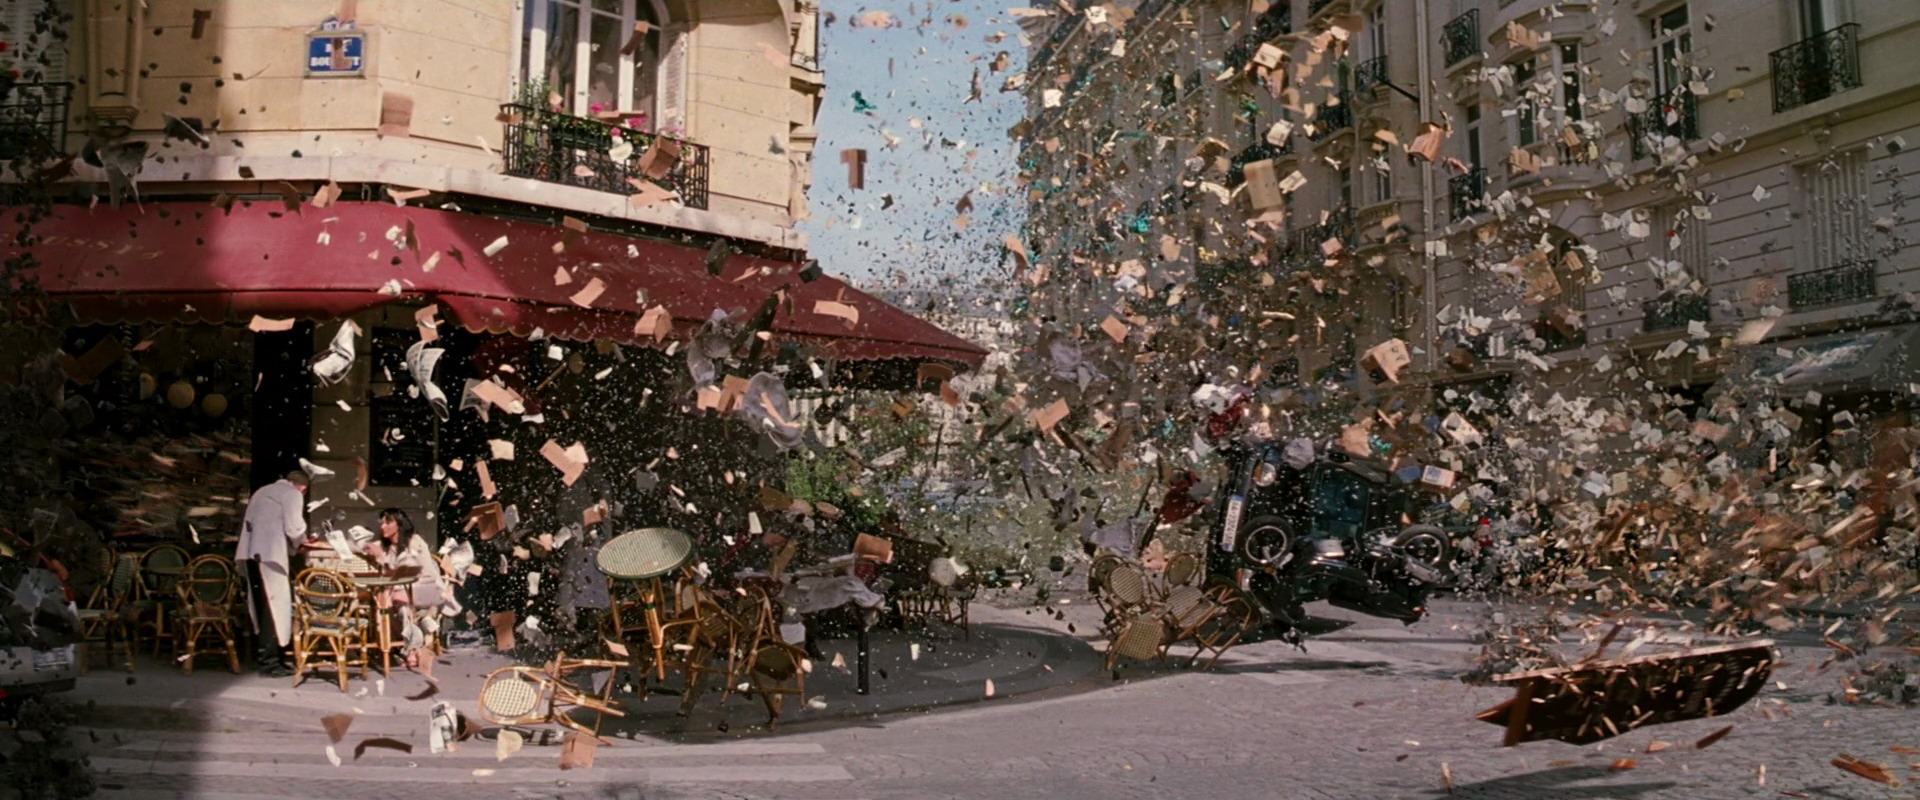 Inception, 2010, Christopher Nolan